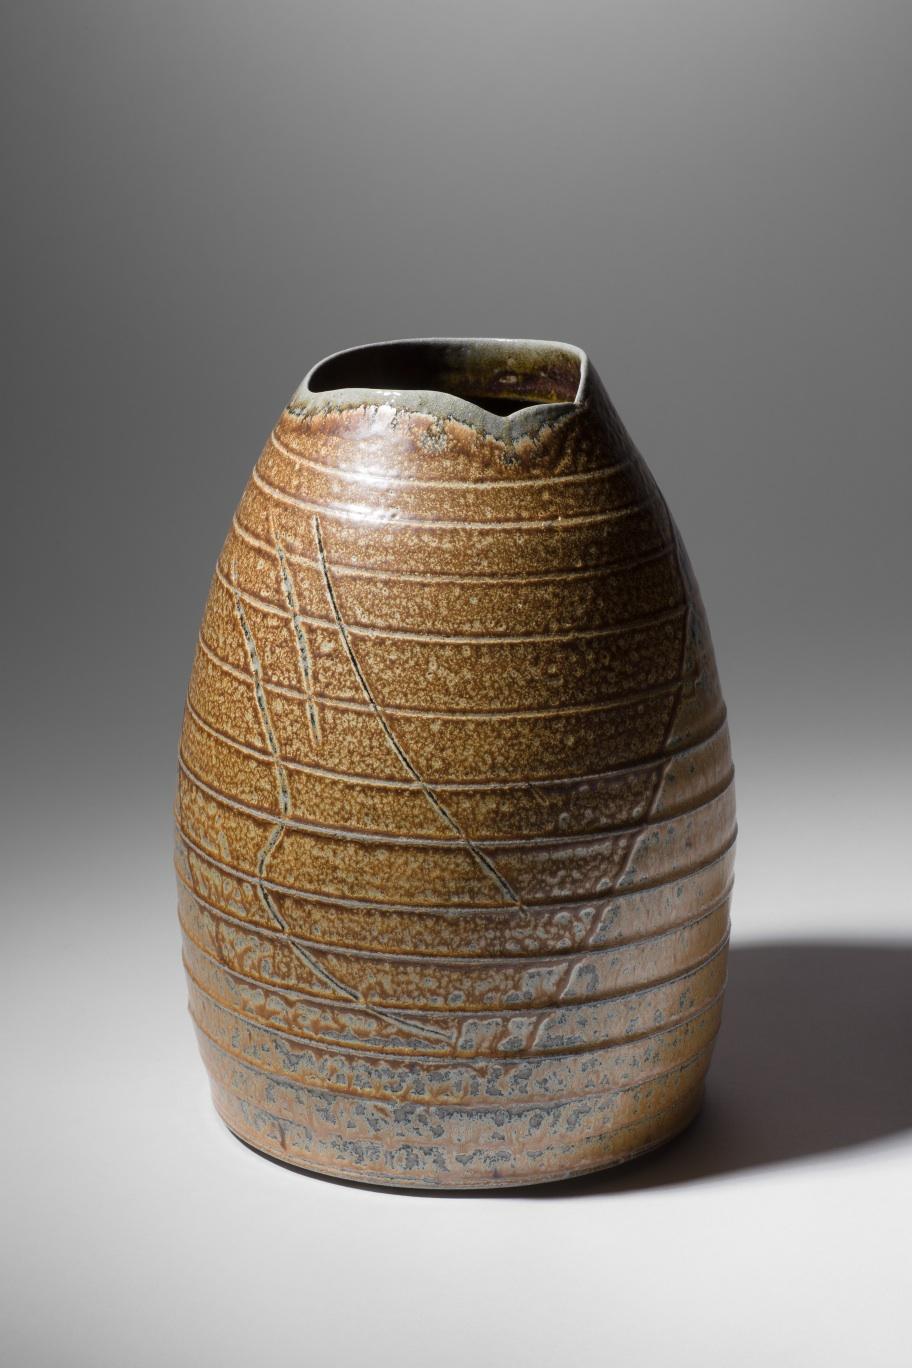 Mandy Parslow, MP04 Barrel Vessel, wood fired salt glazed stoneware, 27 x 18cm, EUR 340